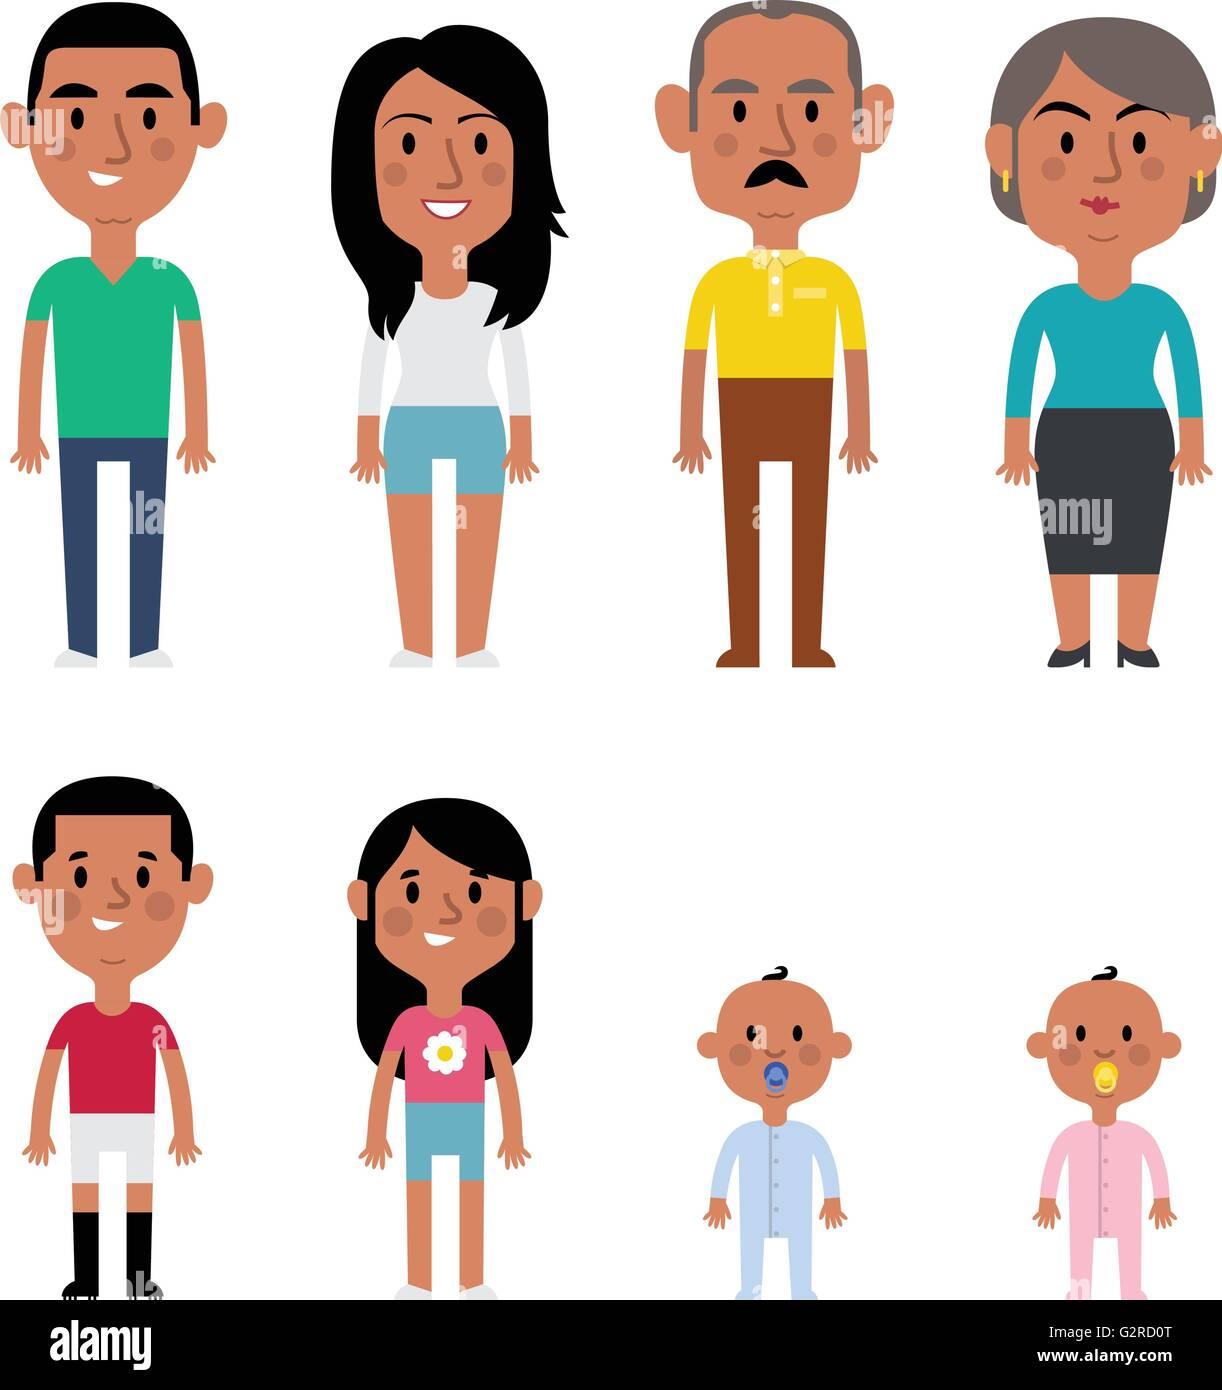 Flat Vector Hispanic Family Members. Parents, Grandparents, Children and Baby - Stock Image